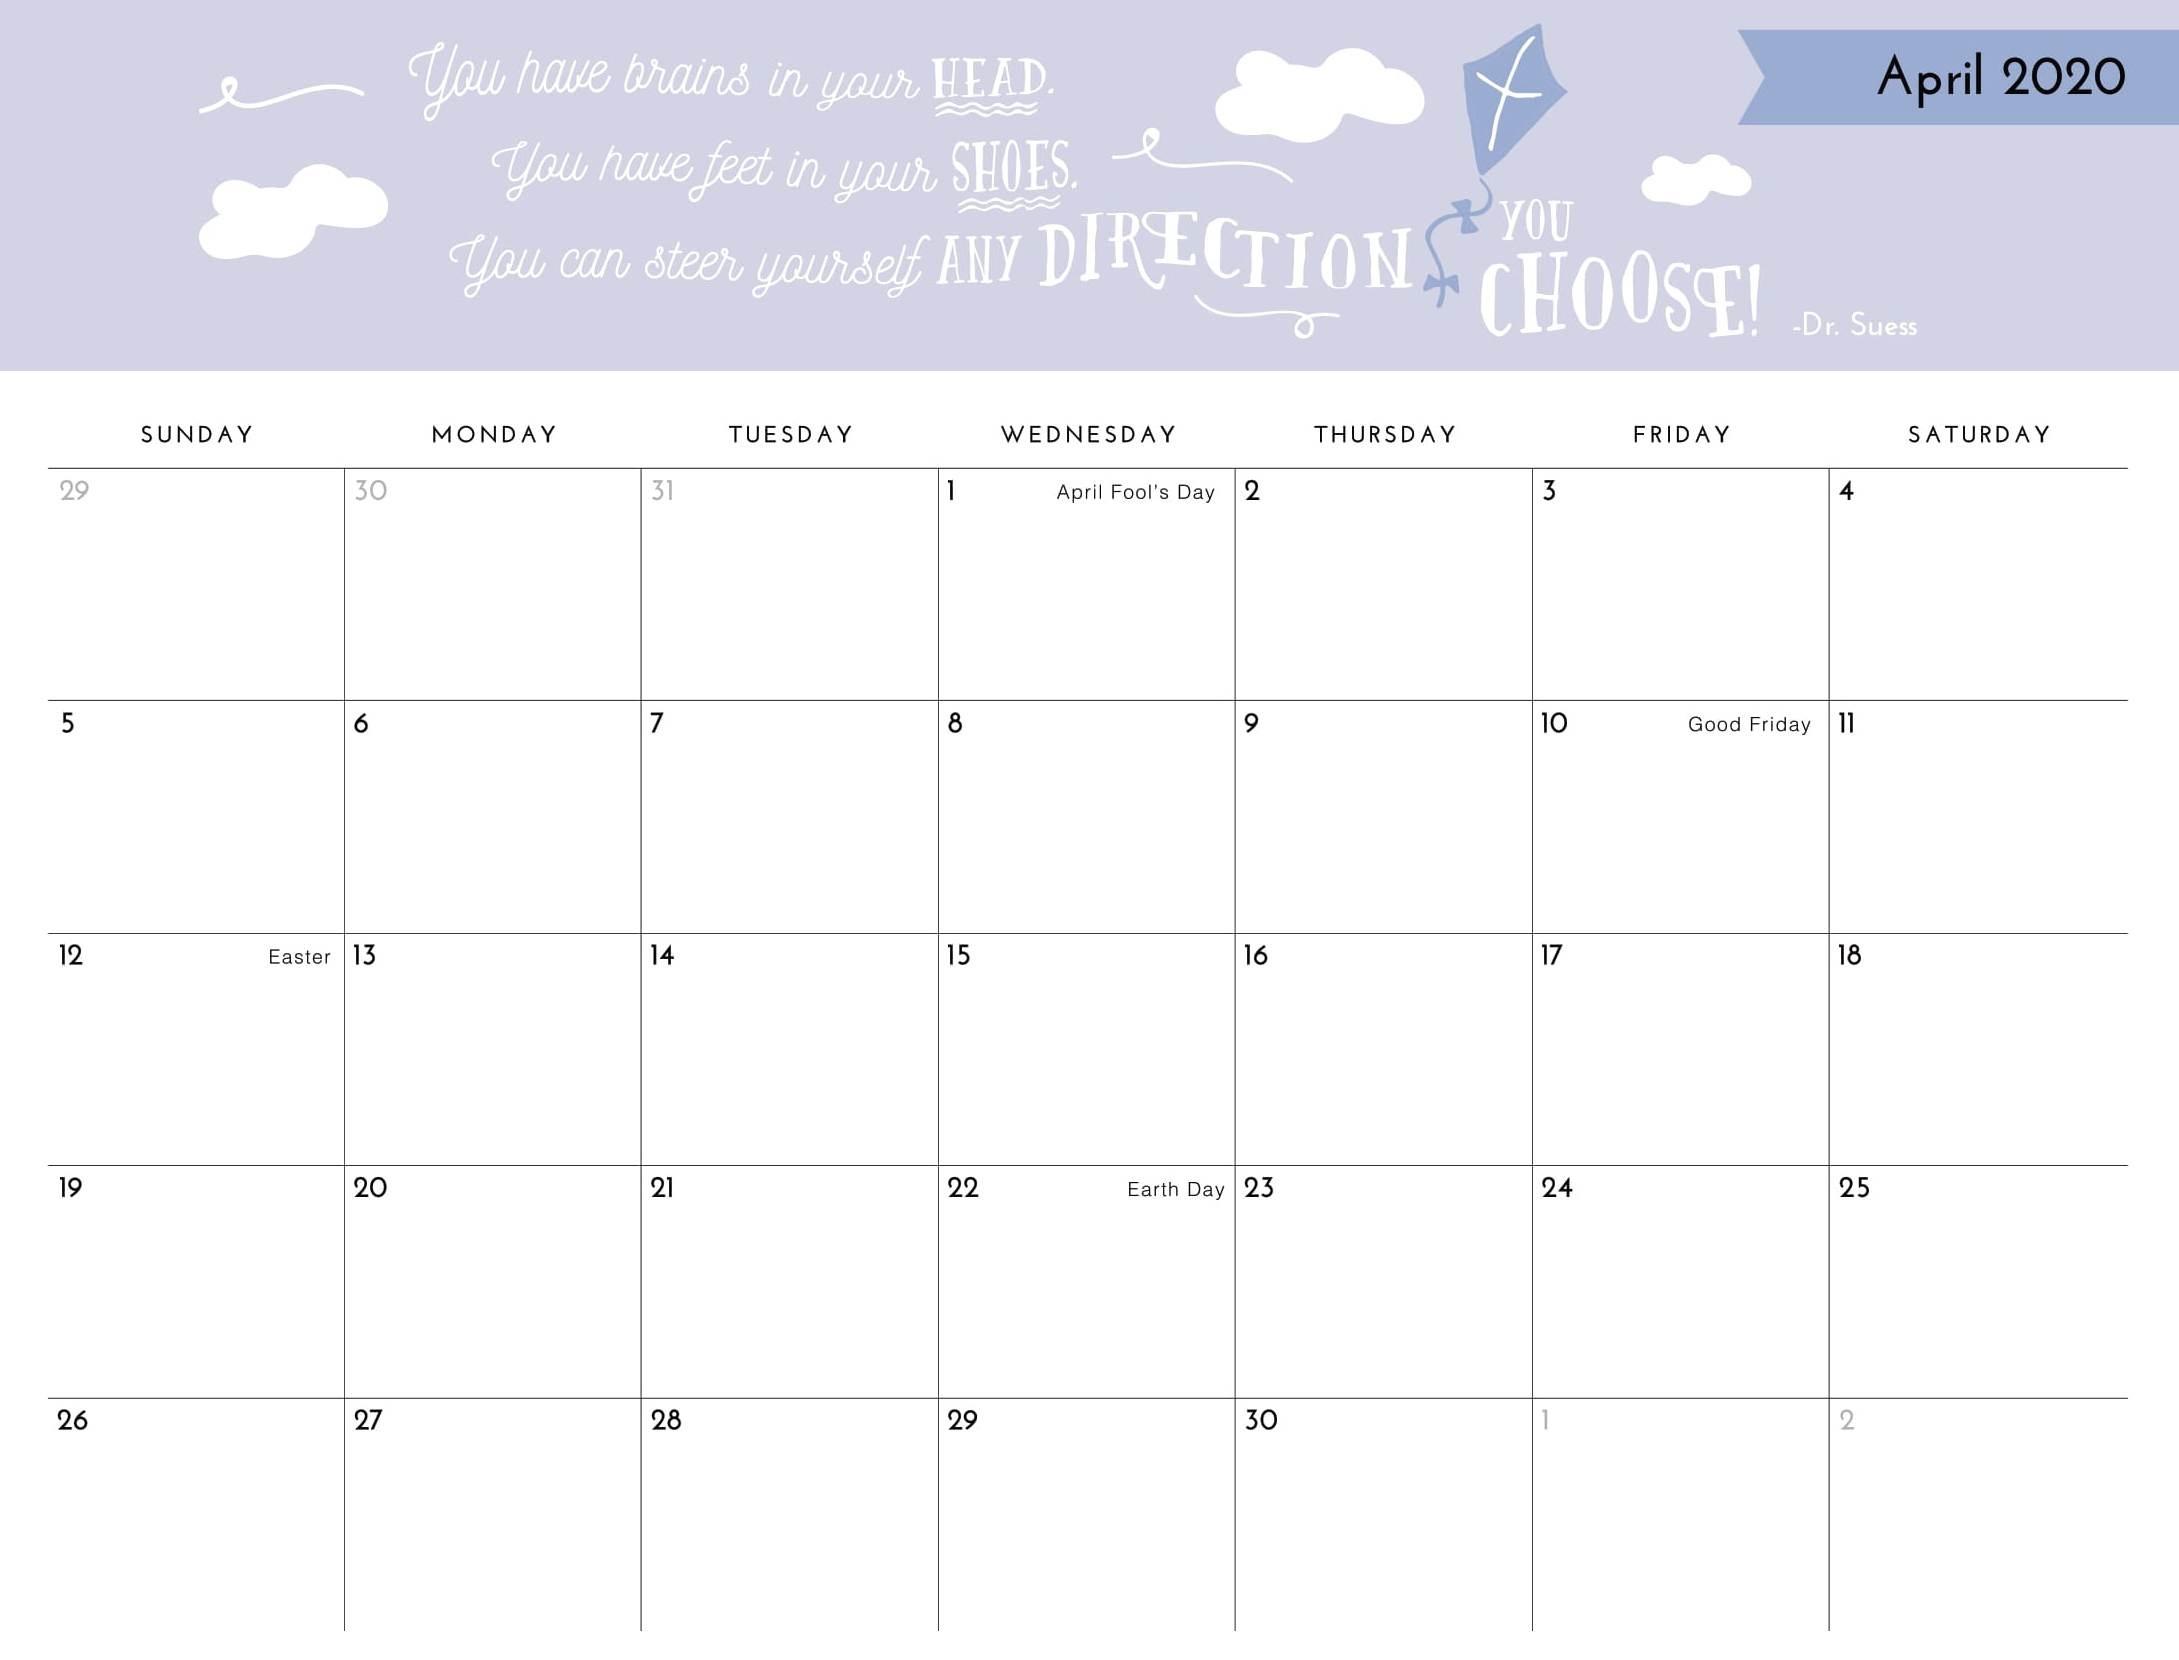 April 2020 Printable Calendar Template With Holidays - Web